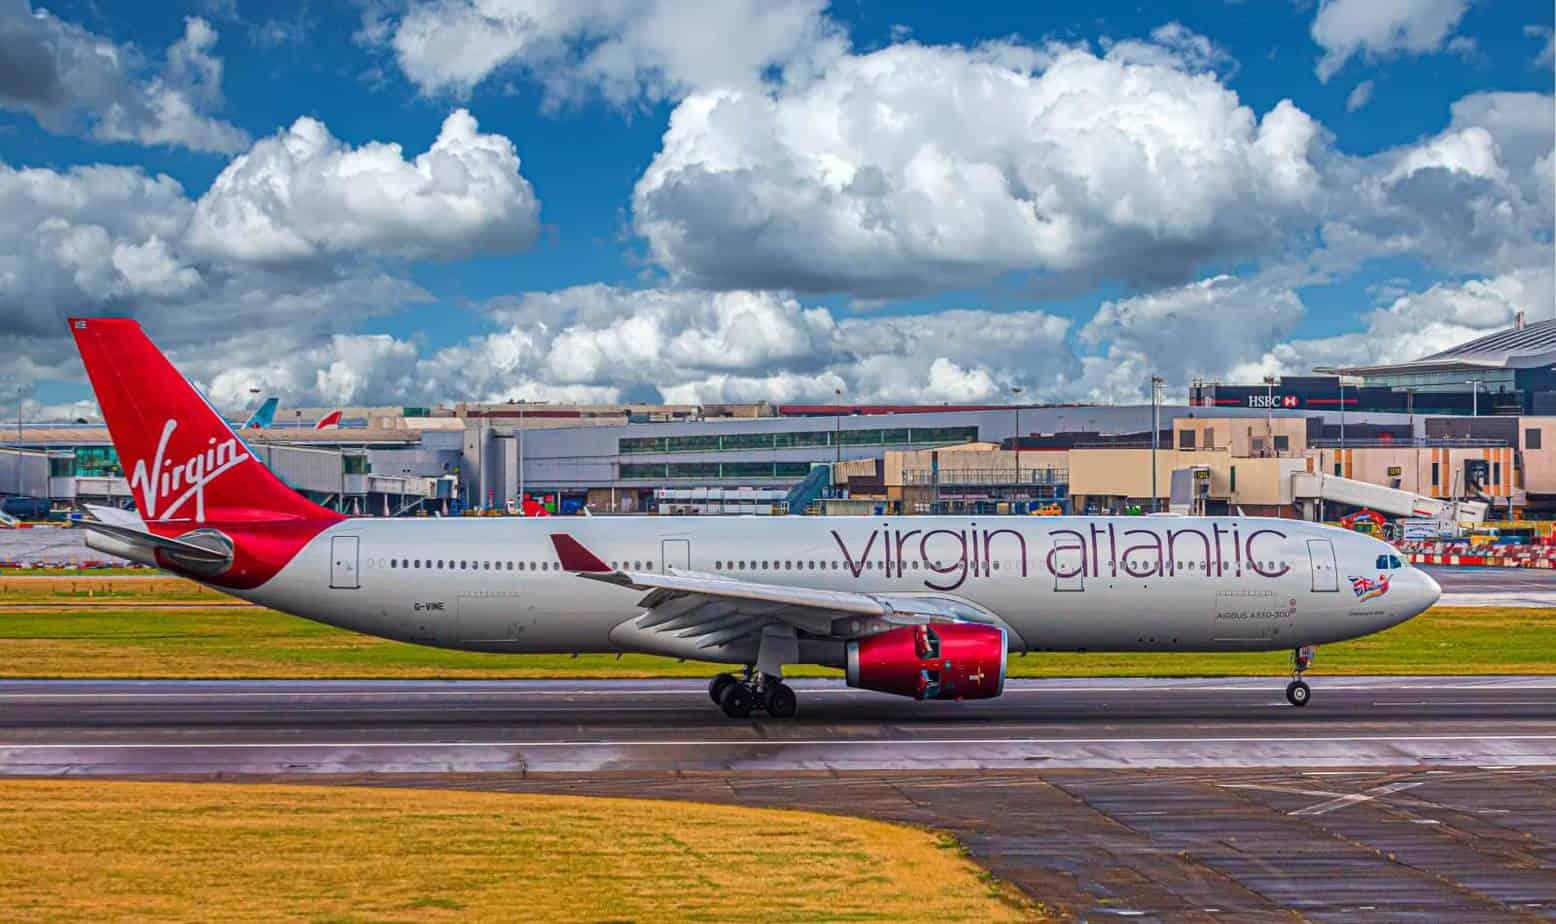 Virgin atlantic airplane carrying disabled passengers